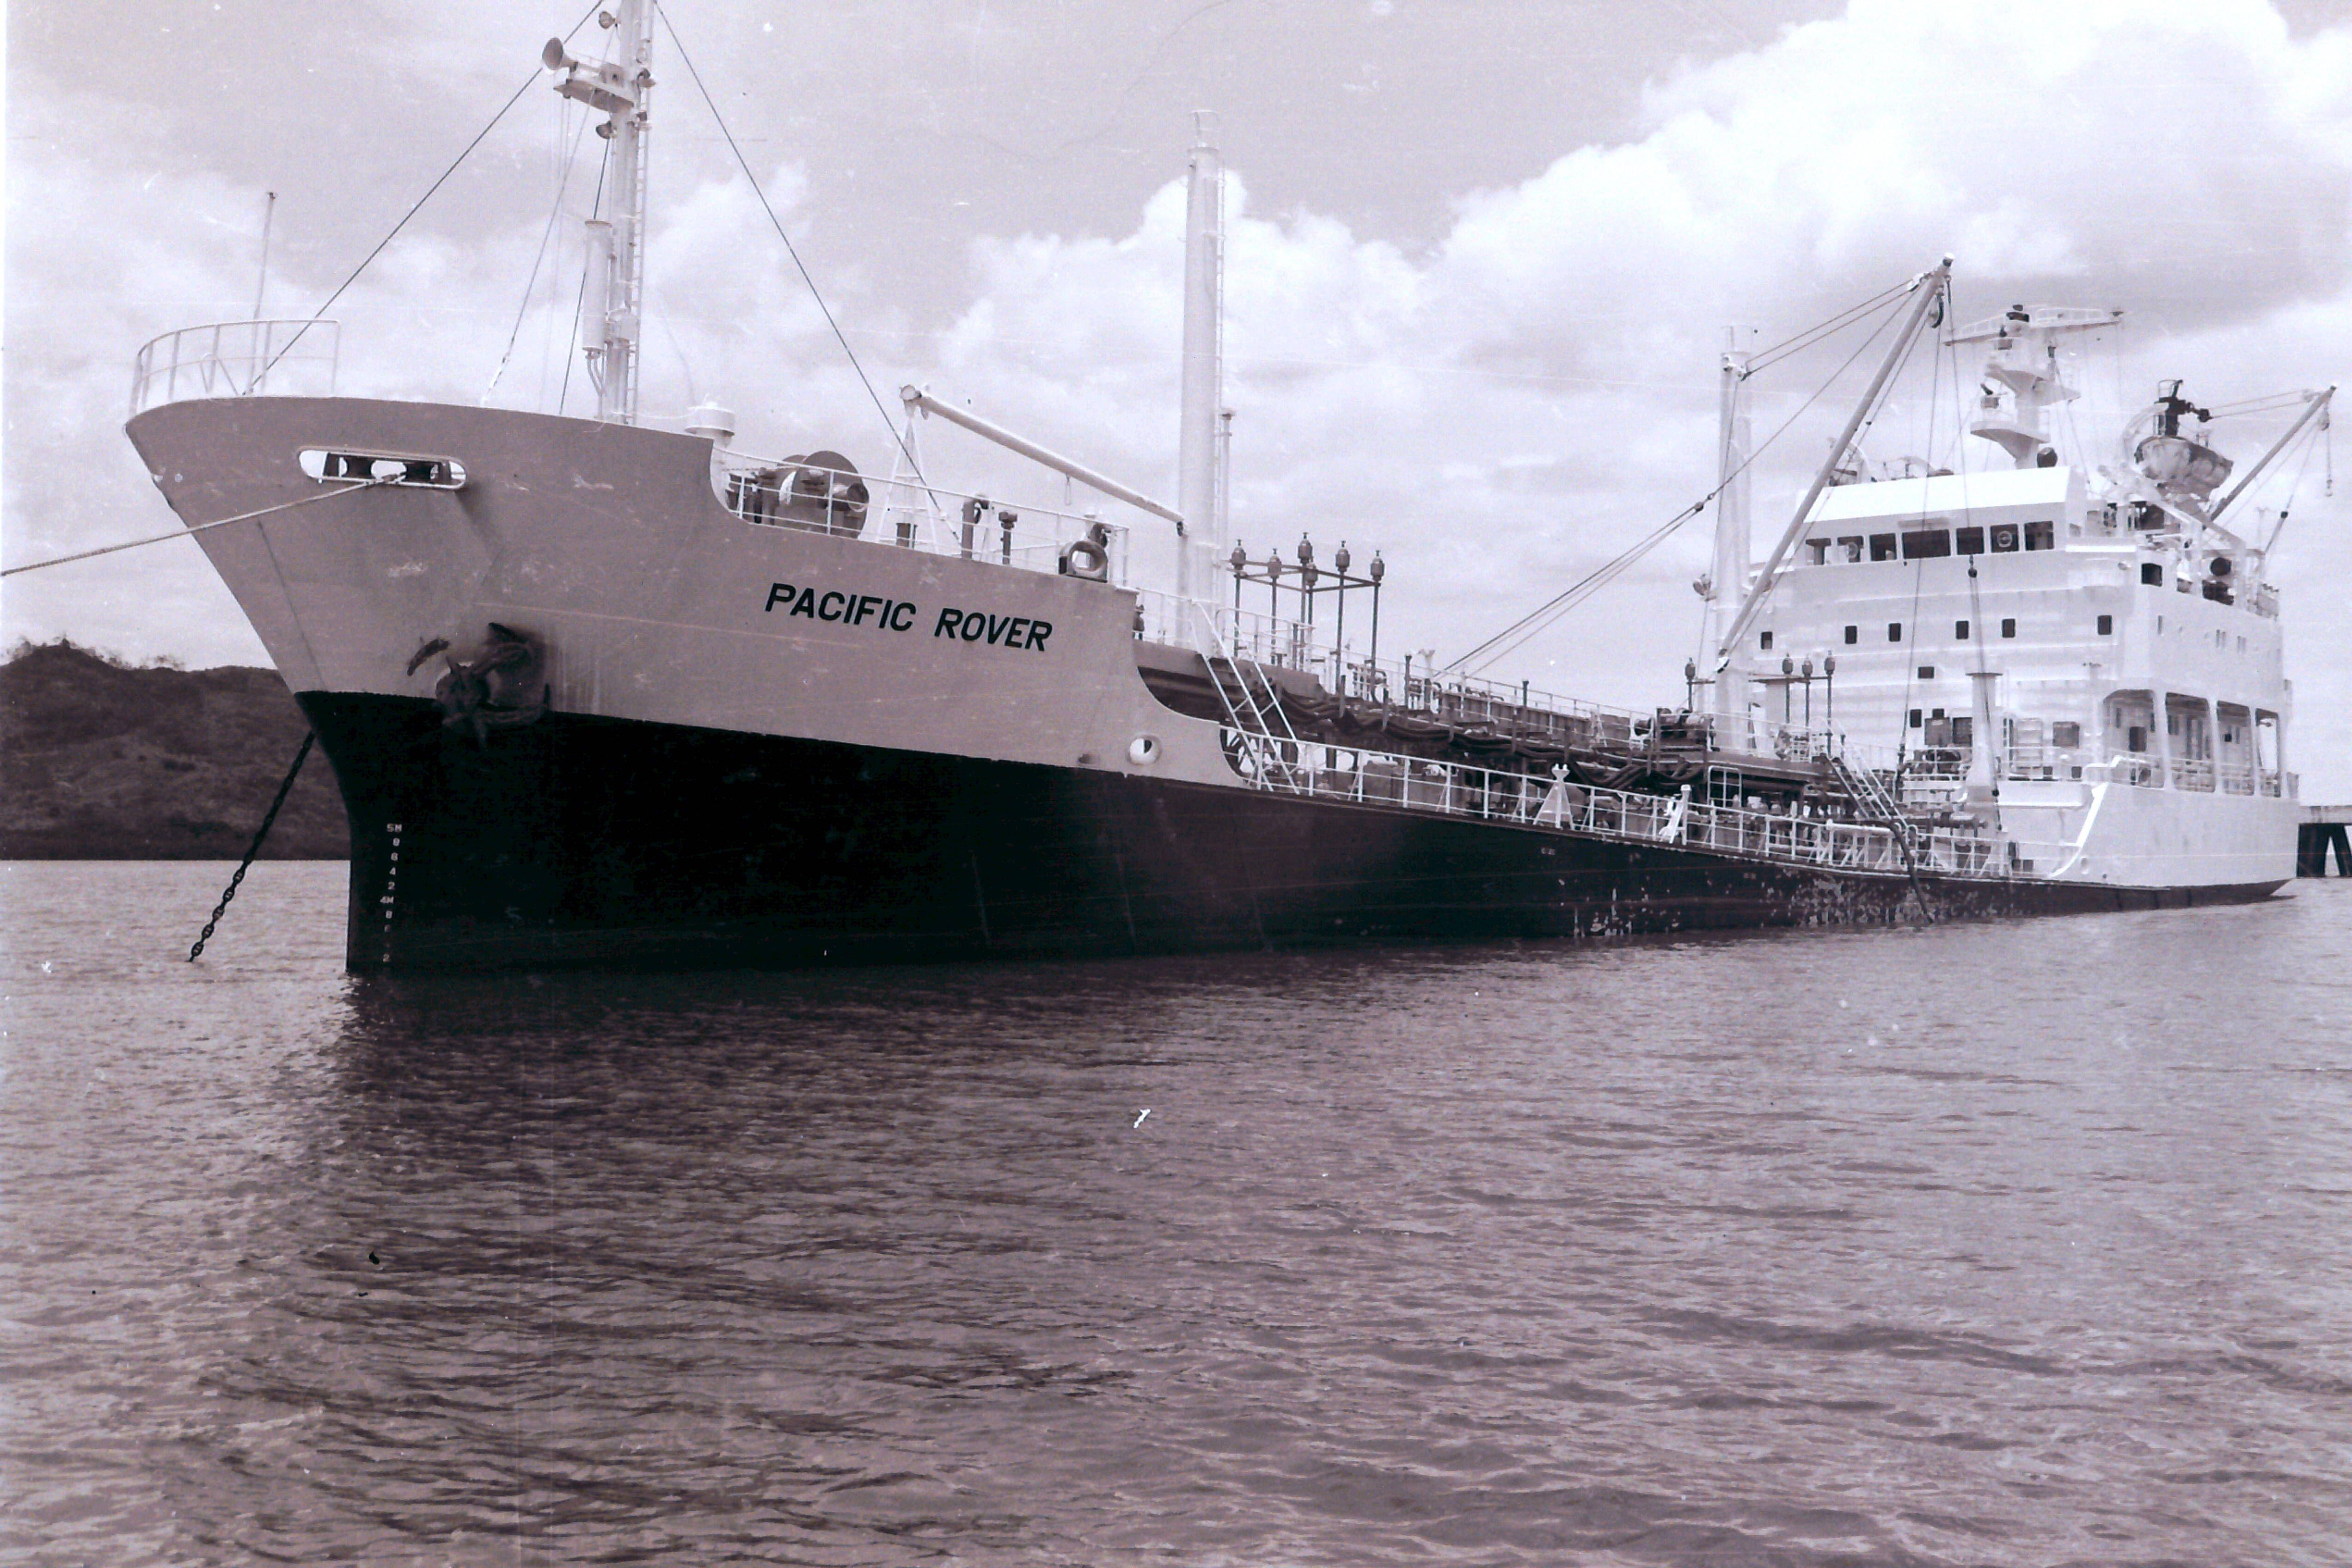 MT Pacific Rover - Loading oil products at Vuda Point.  Lautoka, Fiji. (1983)